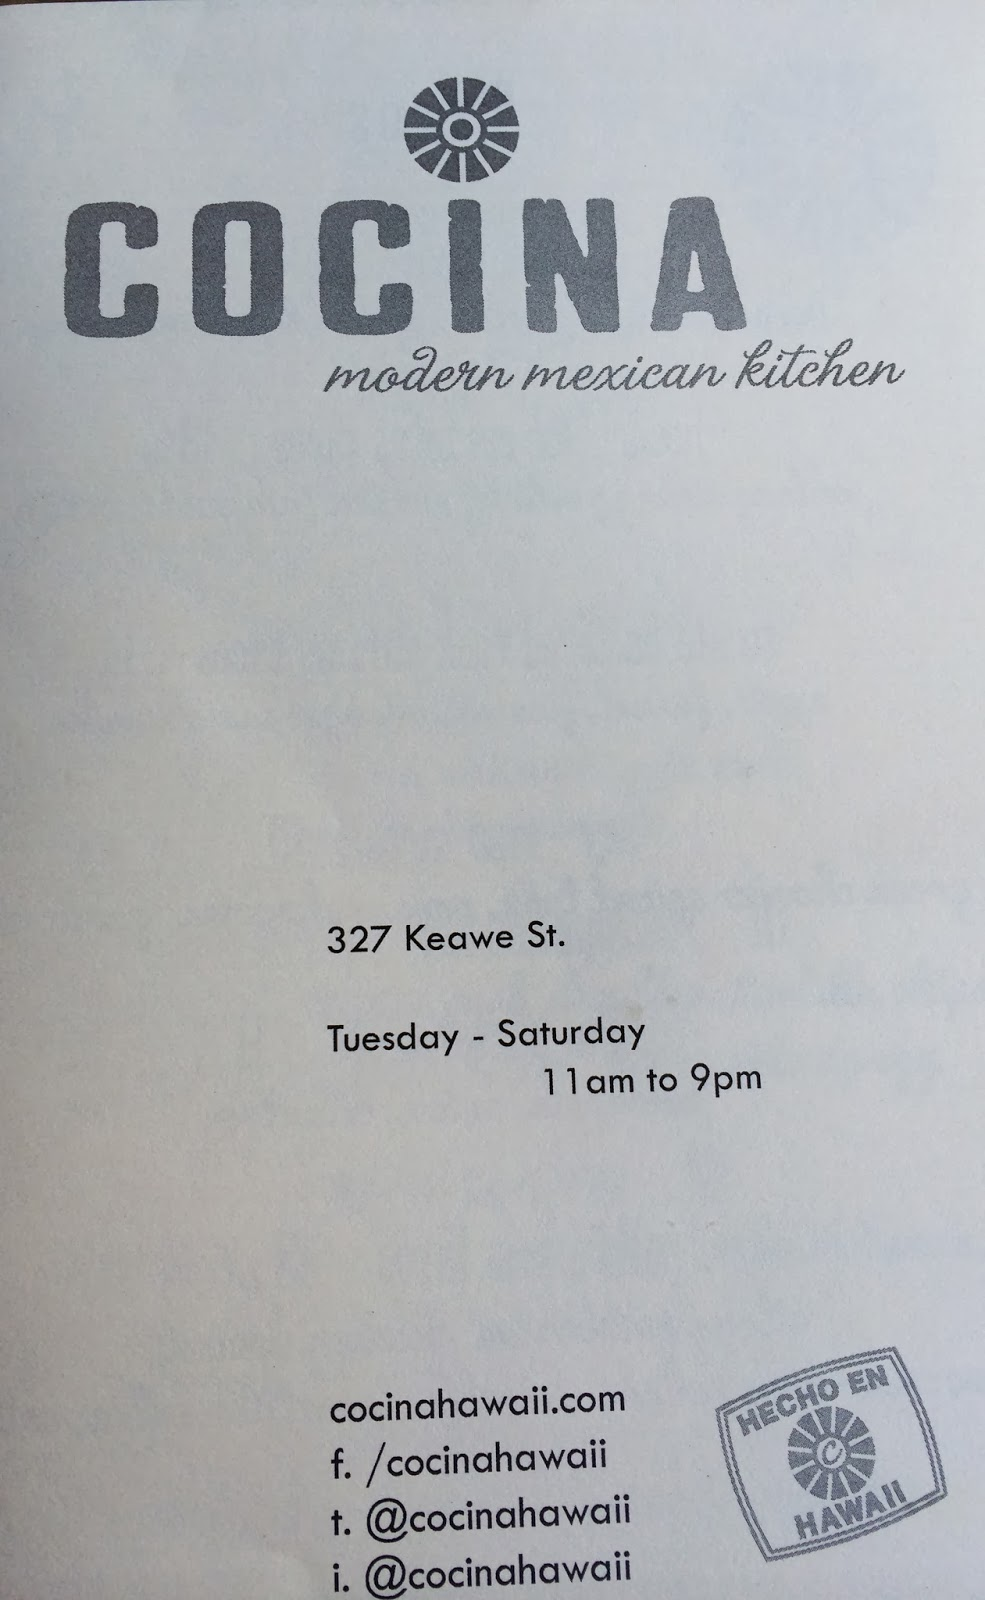 TASTE OF HAWAII: COCINA MODERN MEXICAN KITCHEN